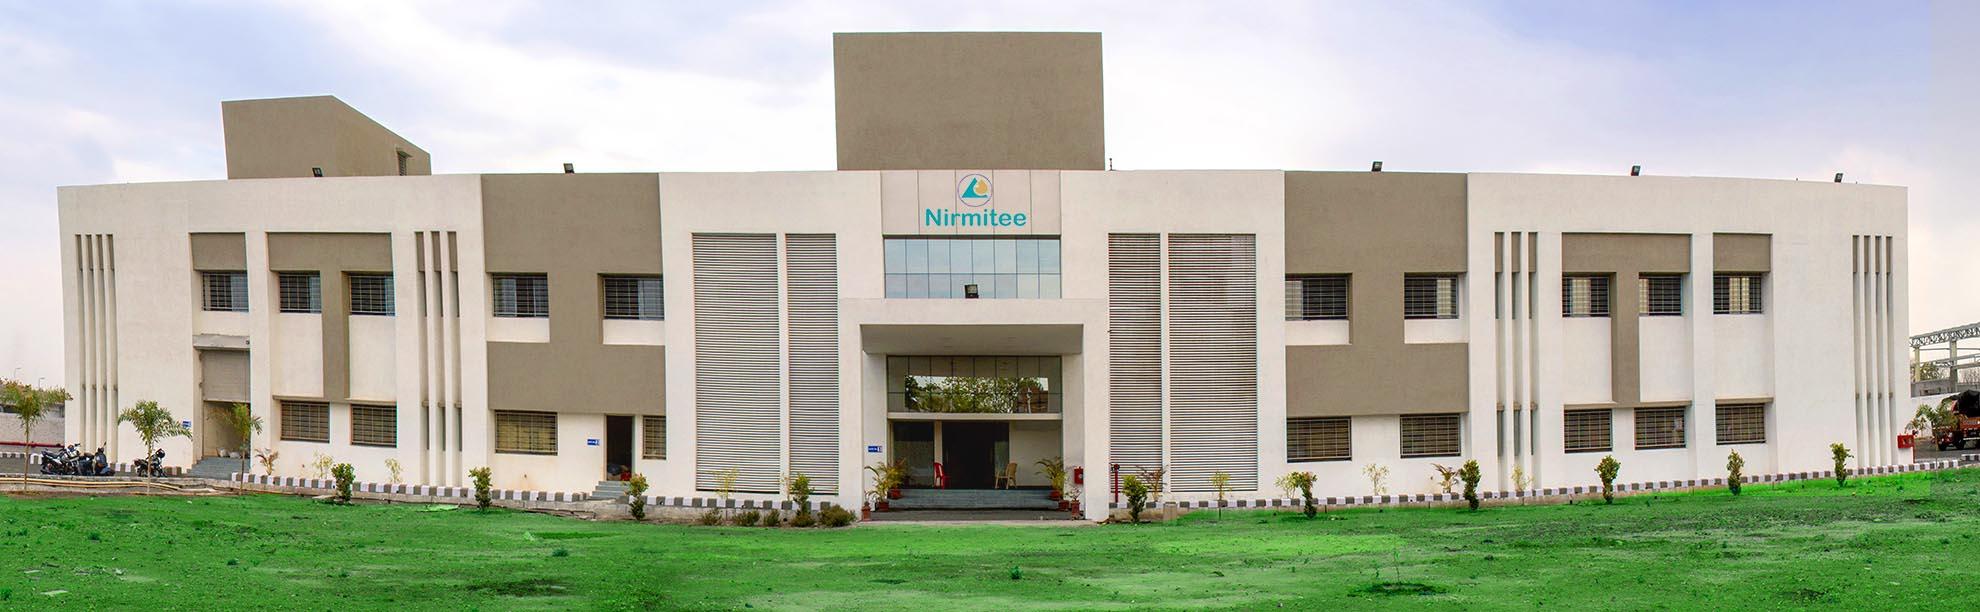 Nirmitee Robotics India Pvt. Ltd - Headquarters & Research Center